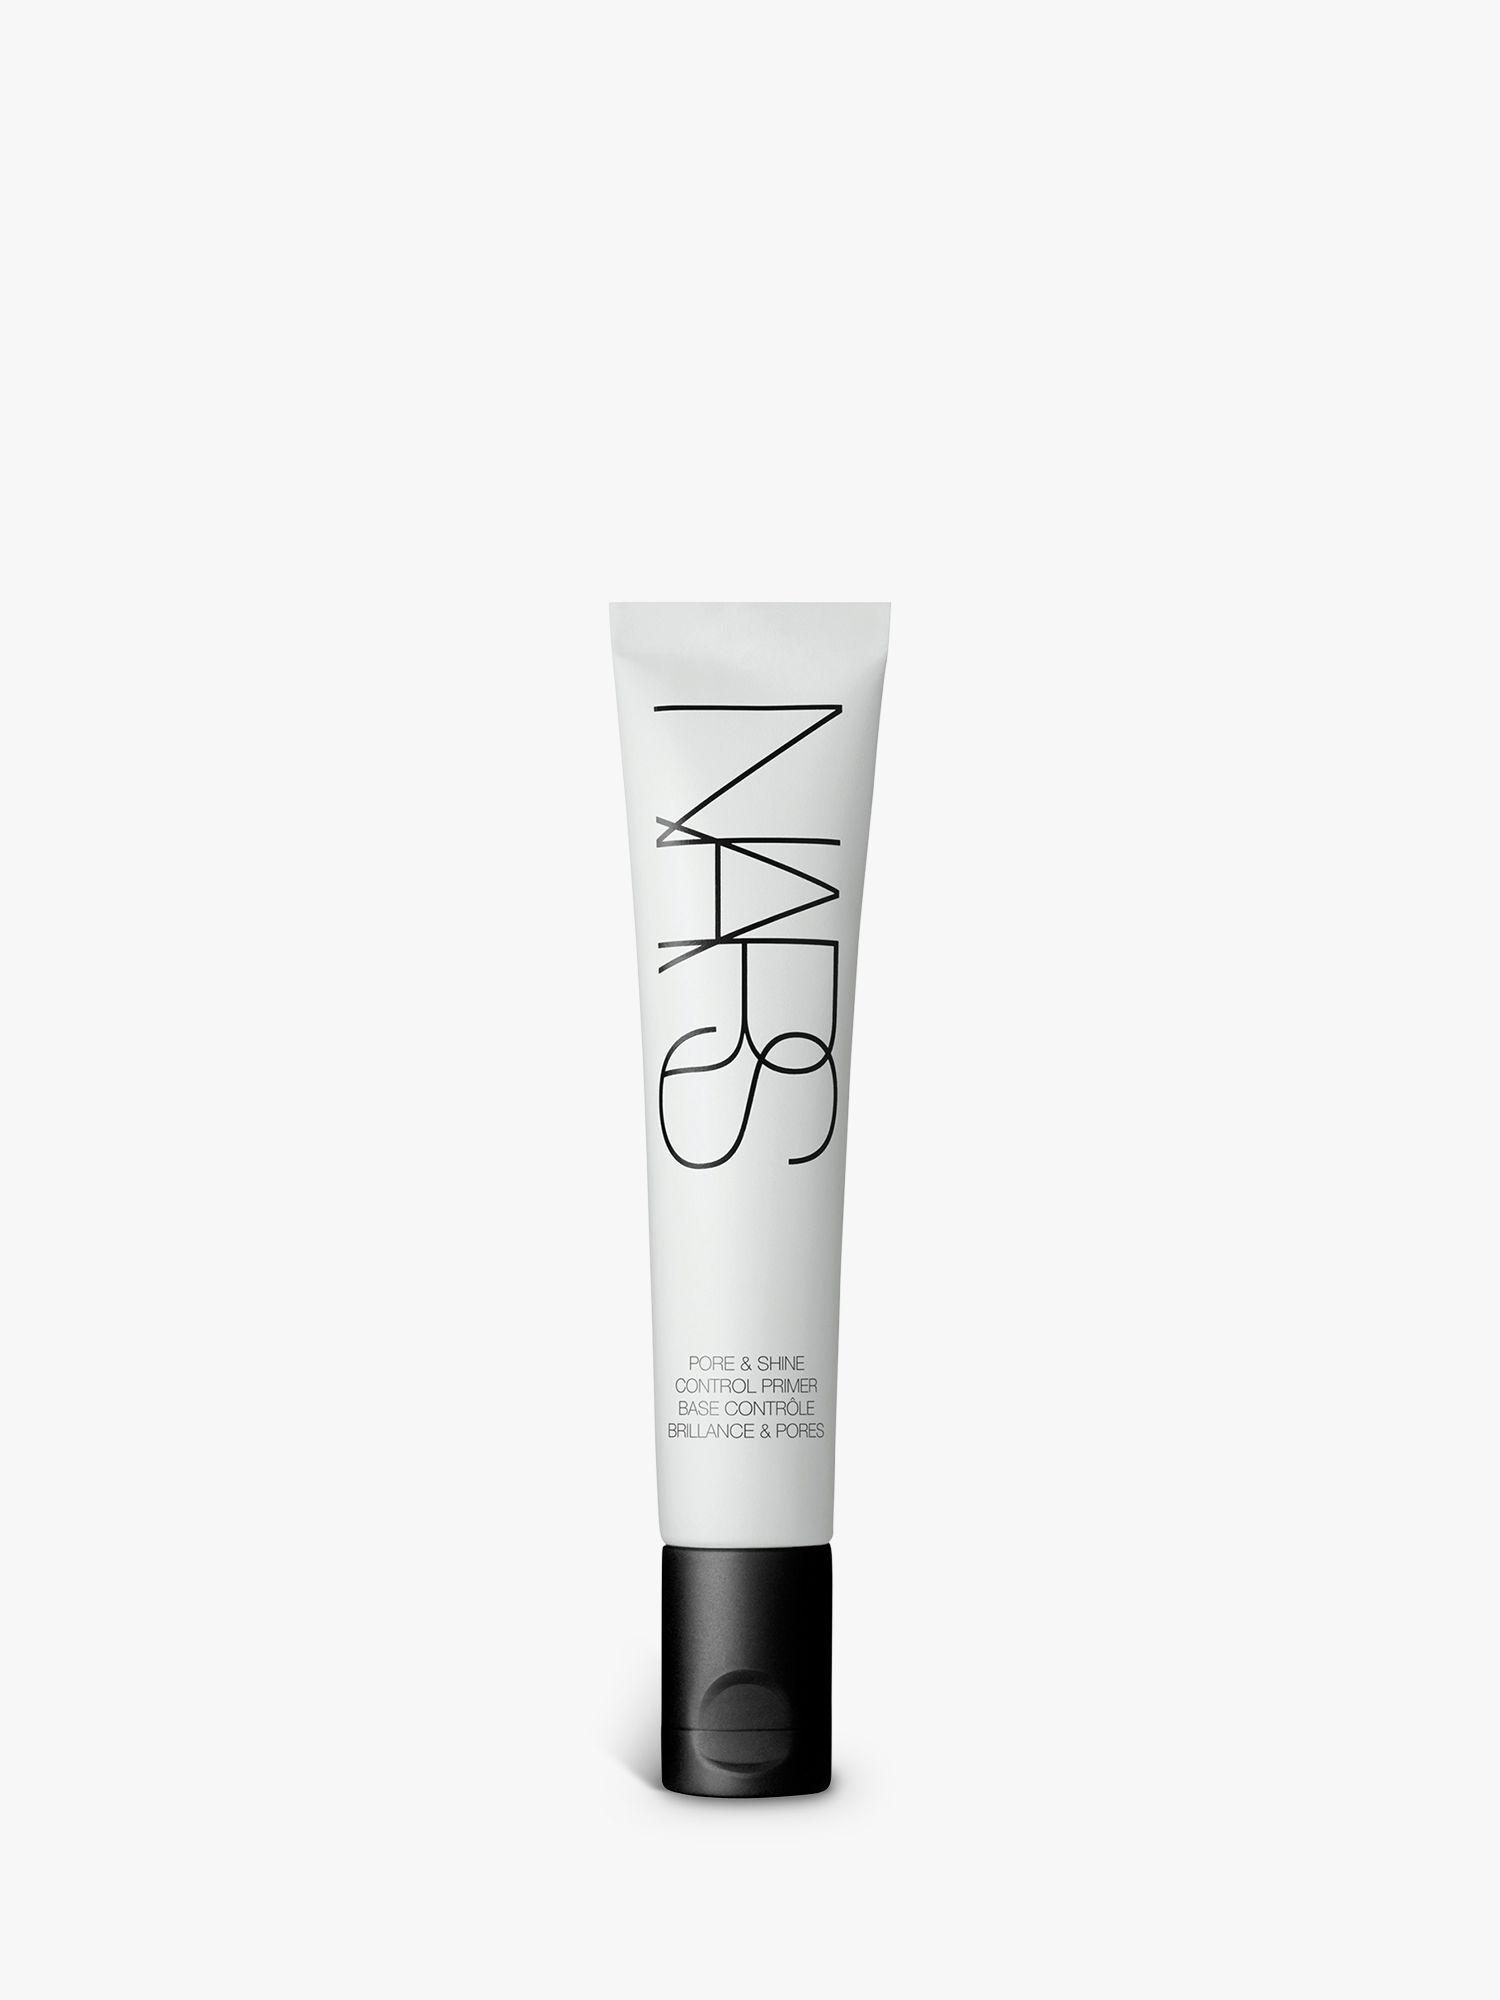 NARS NARS Pore & Shine Control Primer, 30ml